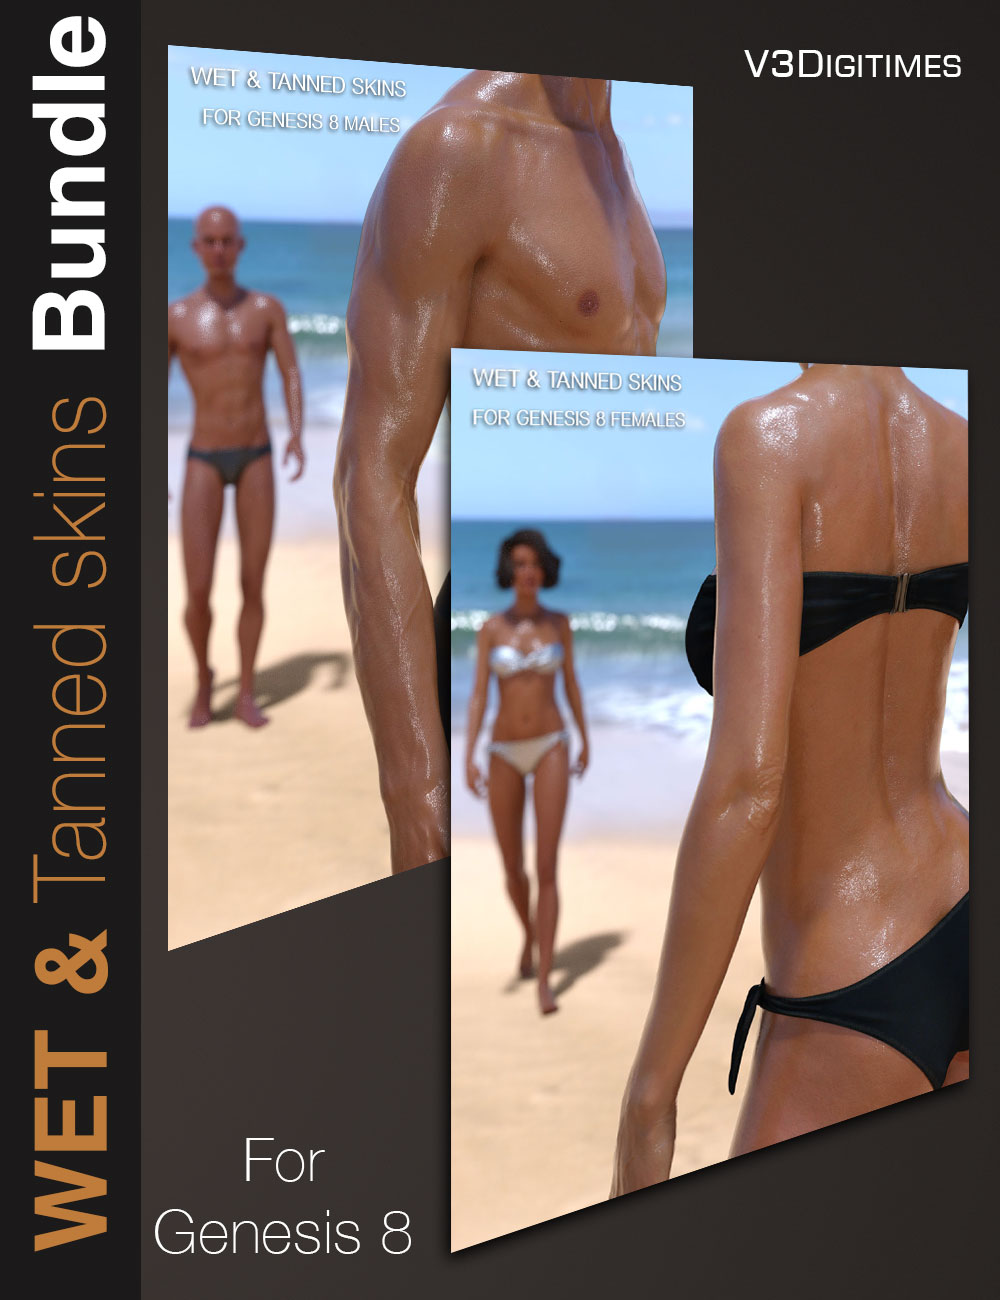 Wet and Tanned Skins for Genesis 8 Bundle by: V3Digitimes, 3D Models by Daz 3D